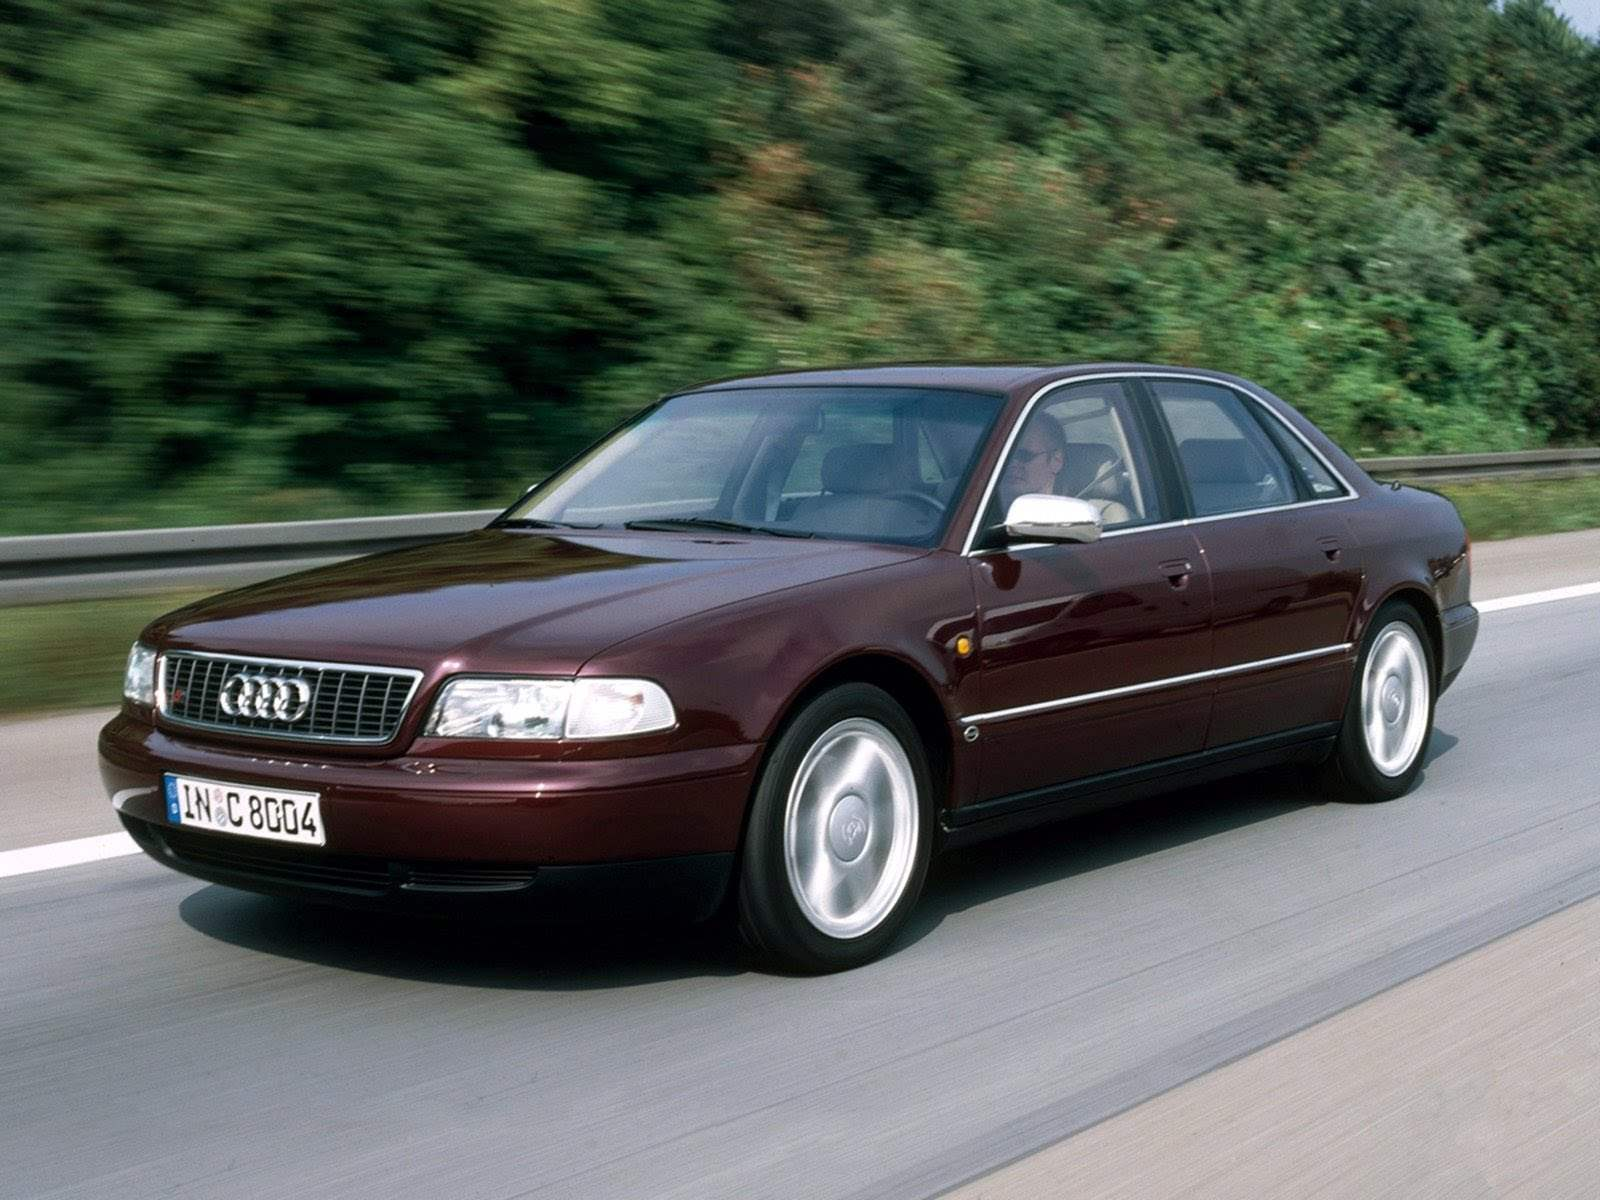 AUDI A8/S8 release 1997 — the closest predecessor Executive car AUDI A8 L 6,0 QUATTRO